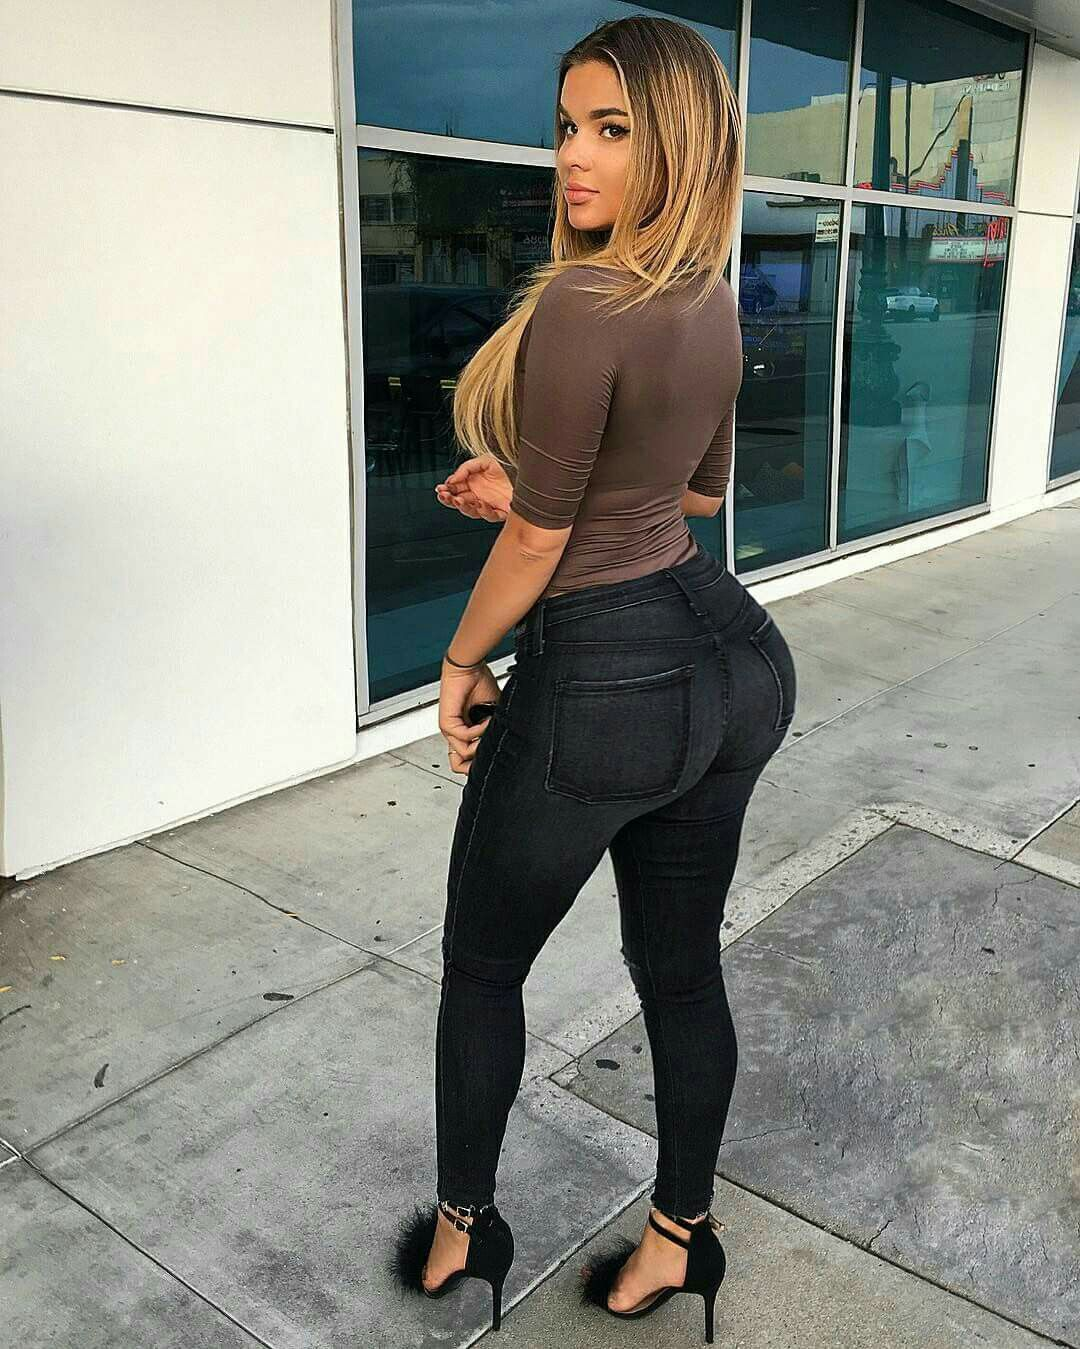 Big ass whole